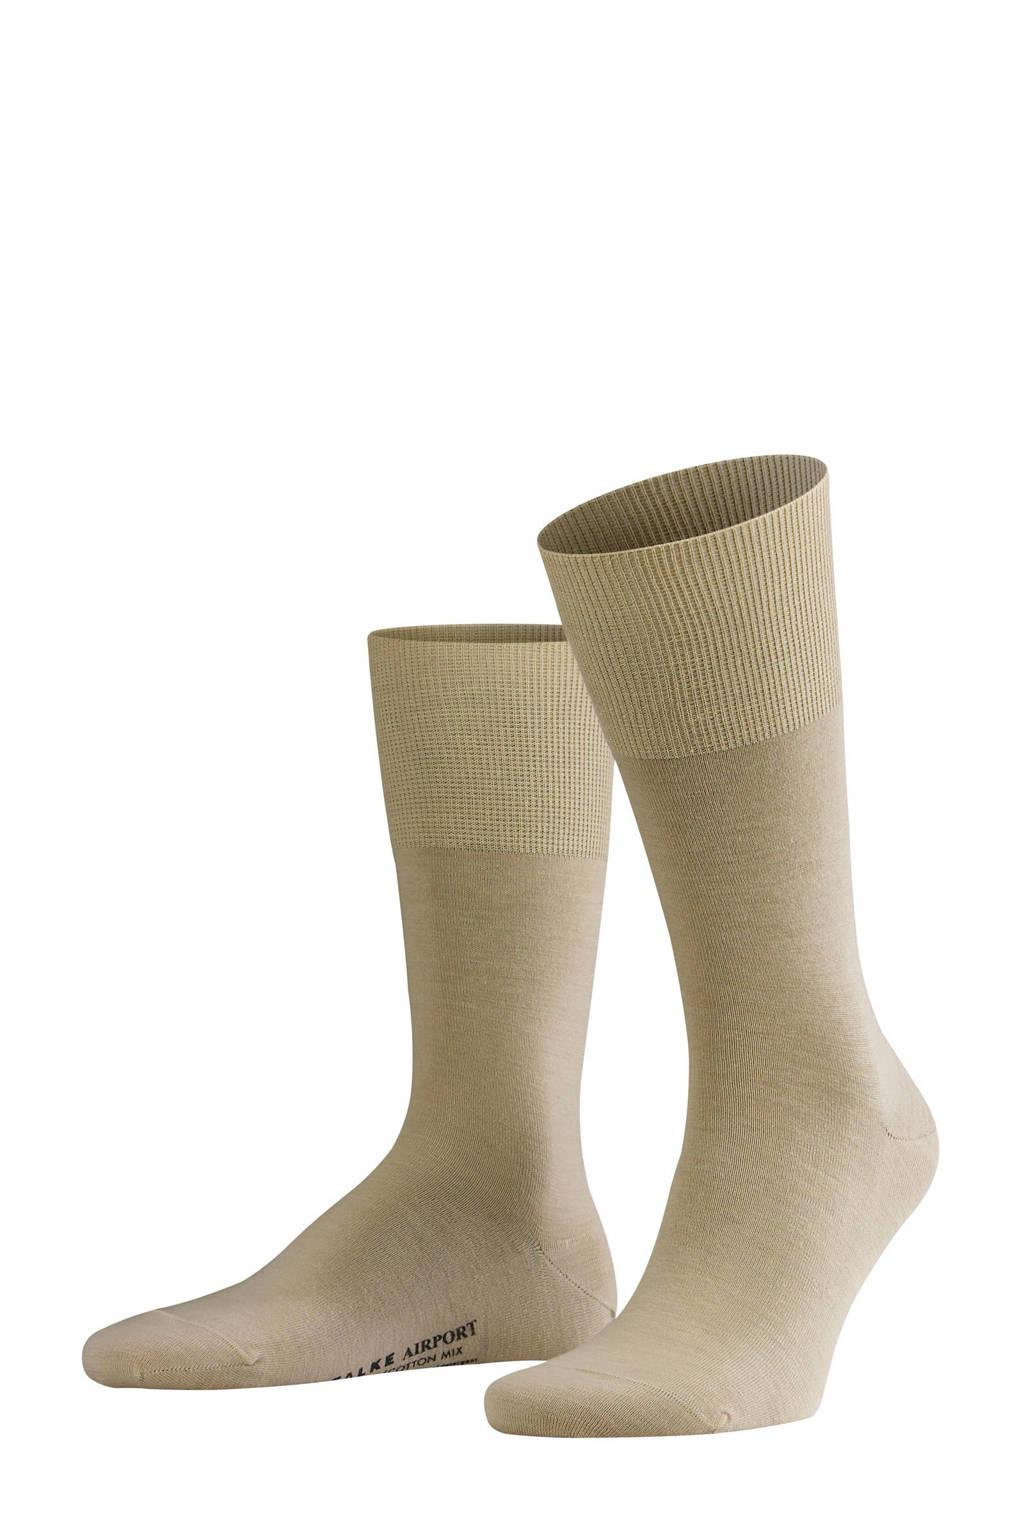 Falke Airport sokken, Zand